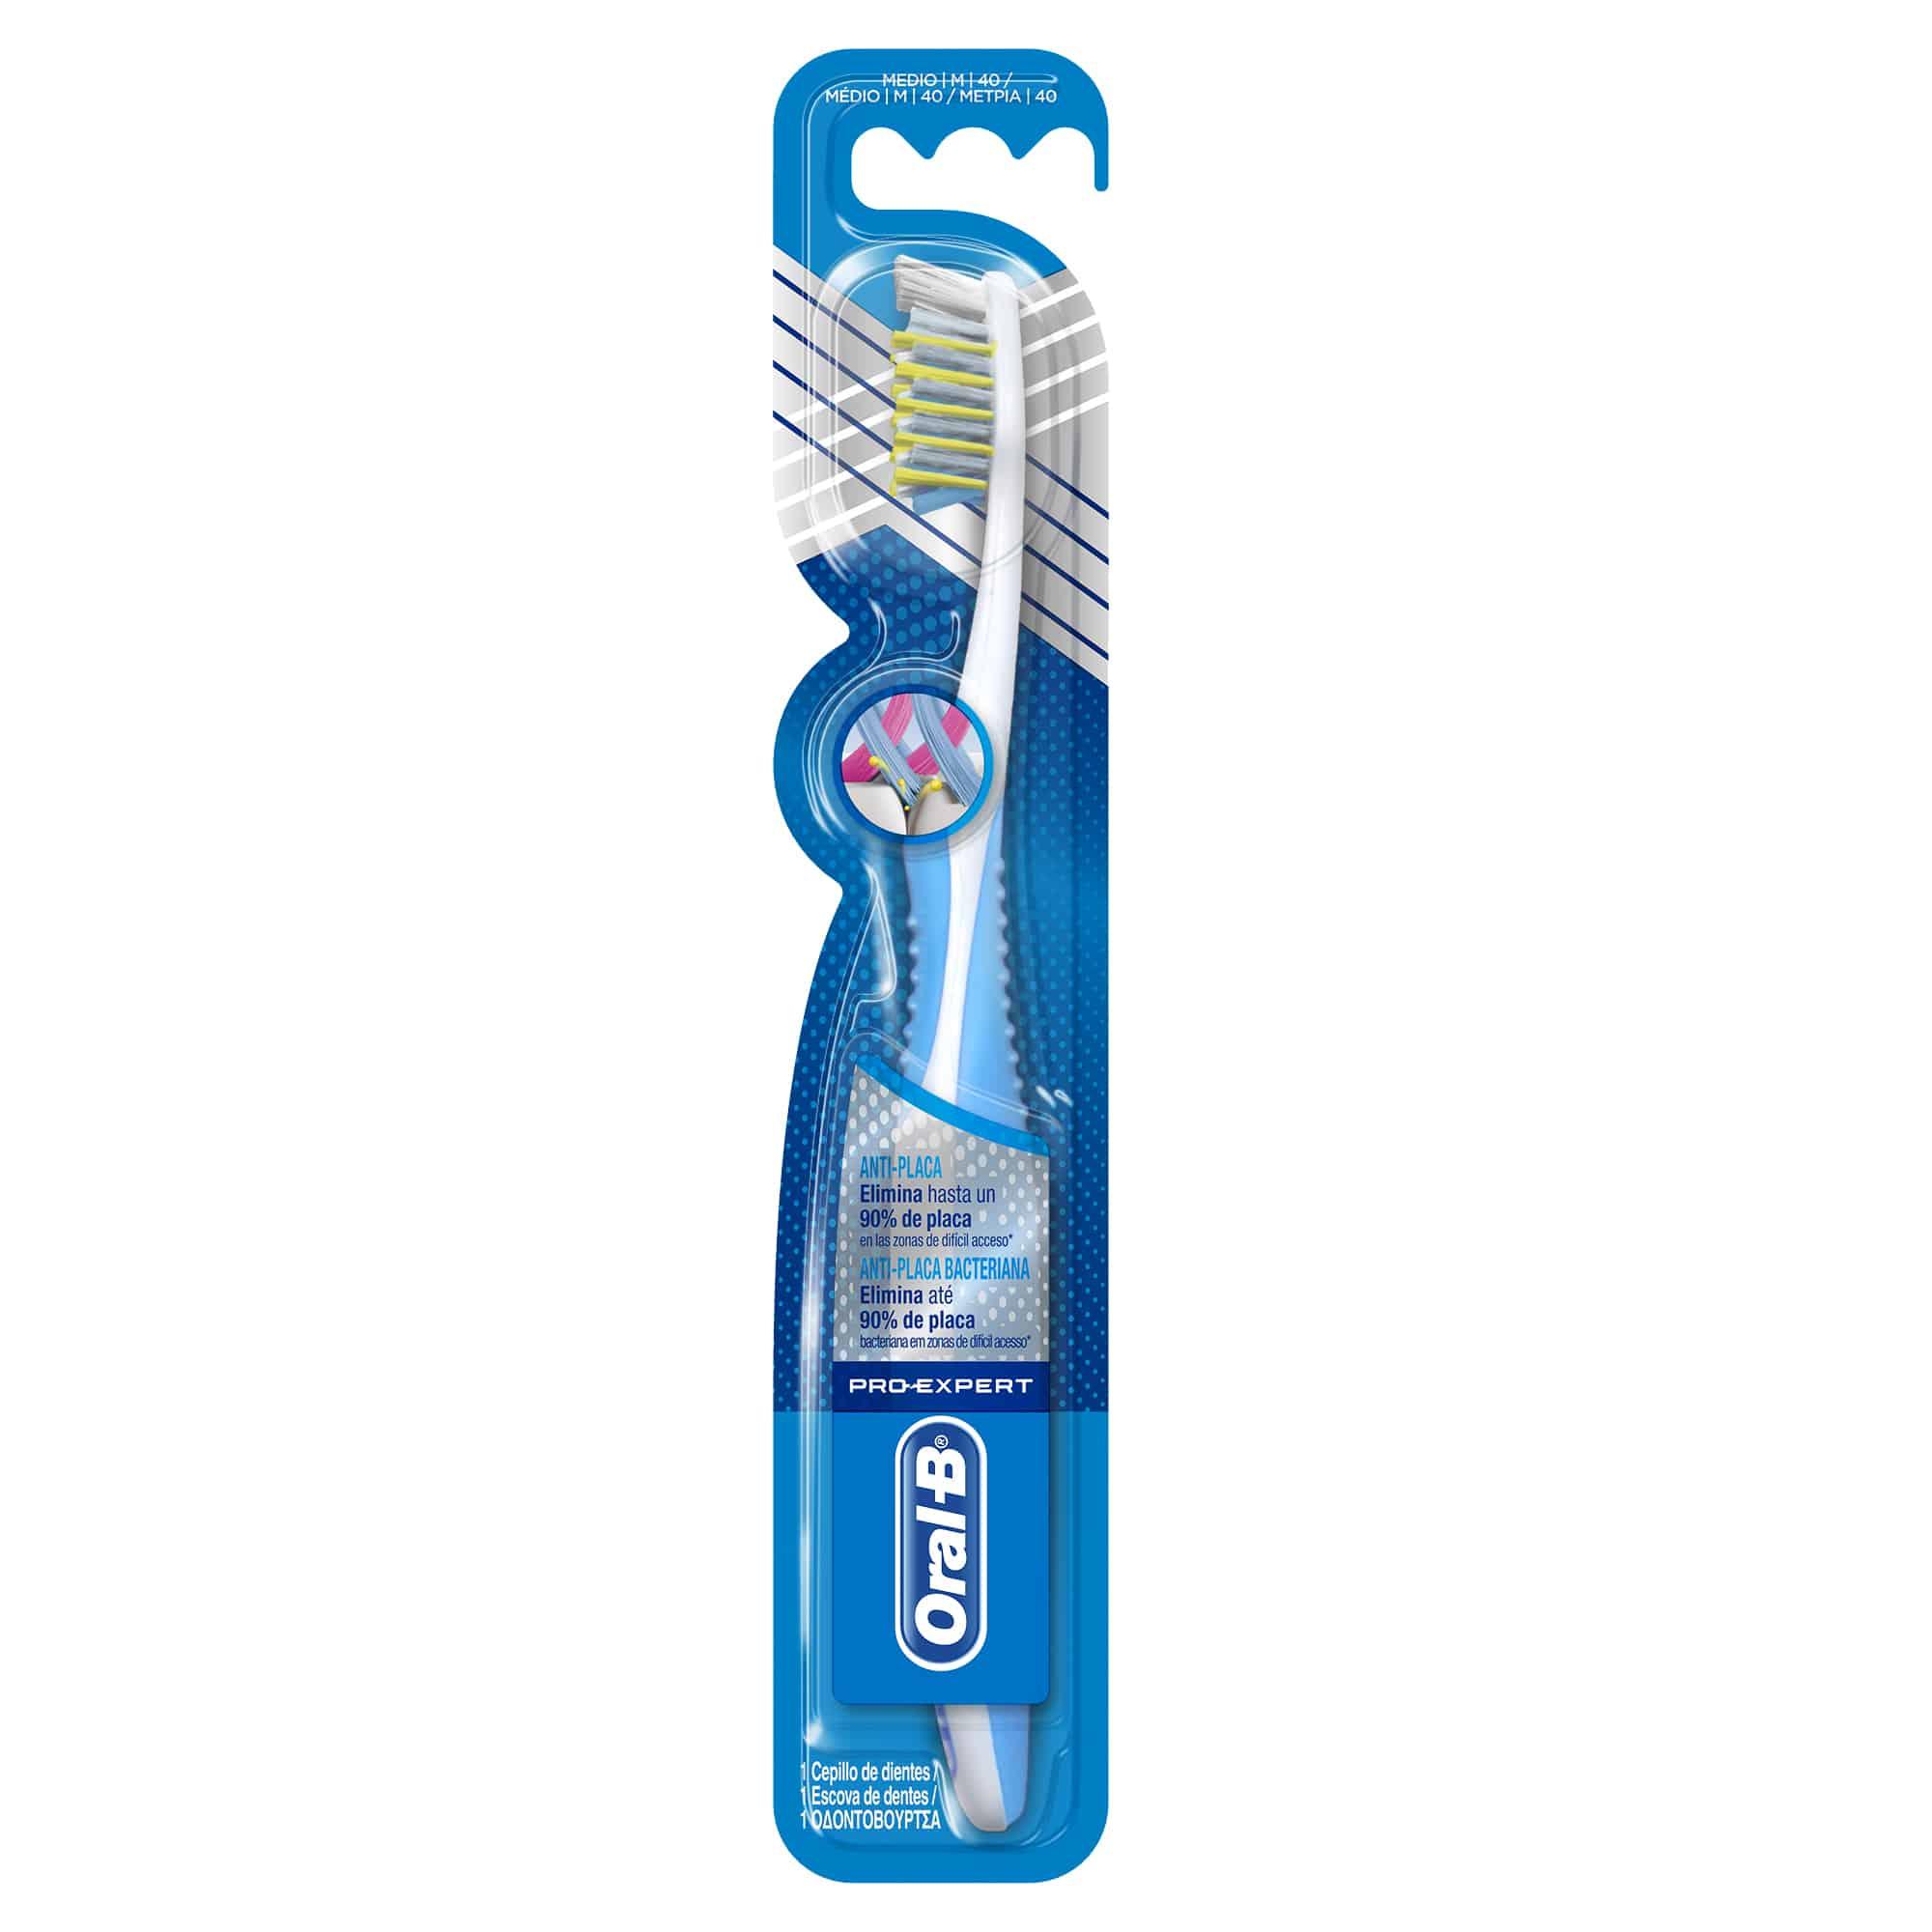 Oral-B Pro Expert Anti-Placa 40 Οδοντόβουρτσα  Medium, 1 τεμάχιο - Γκρι